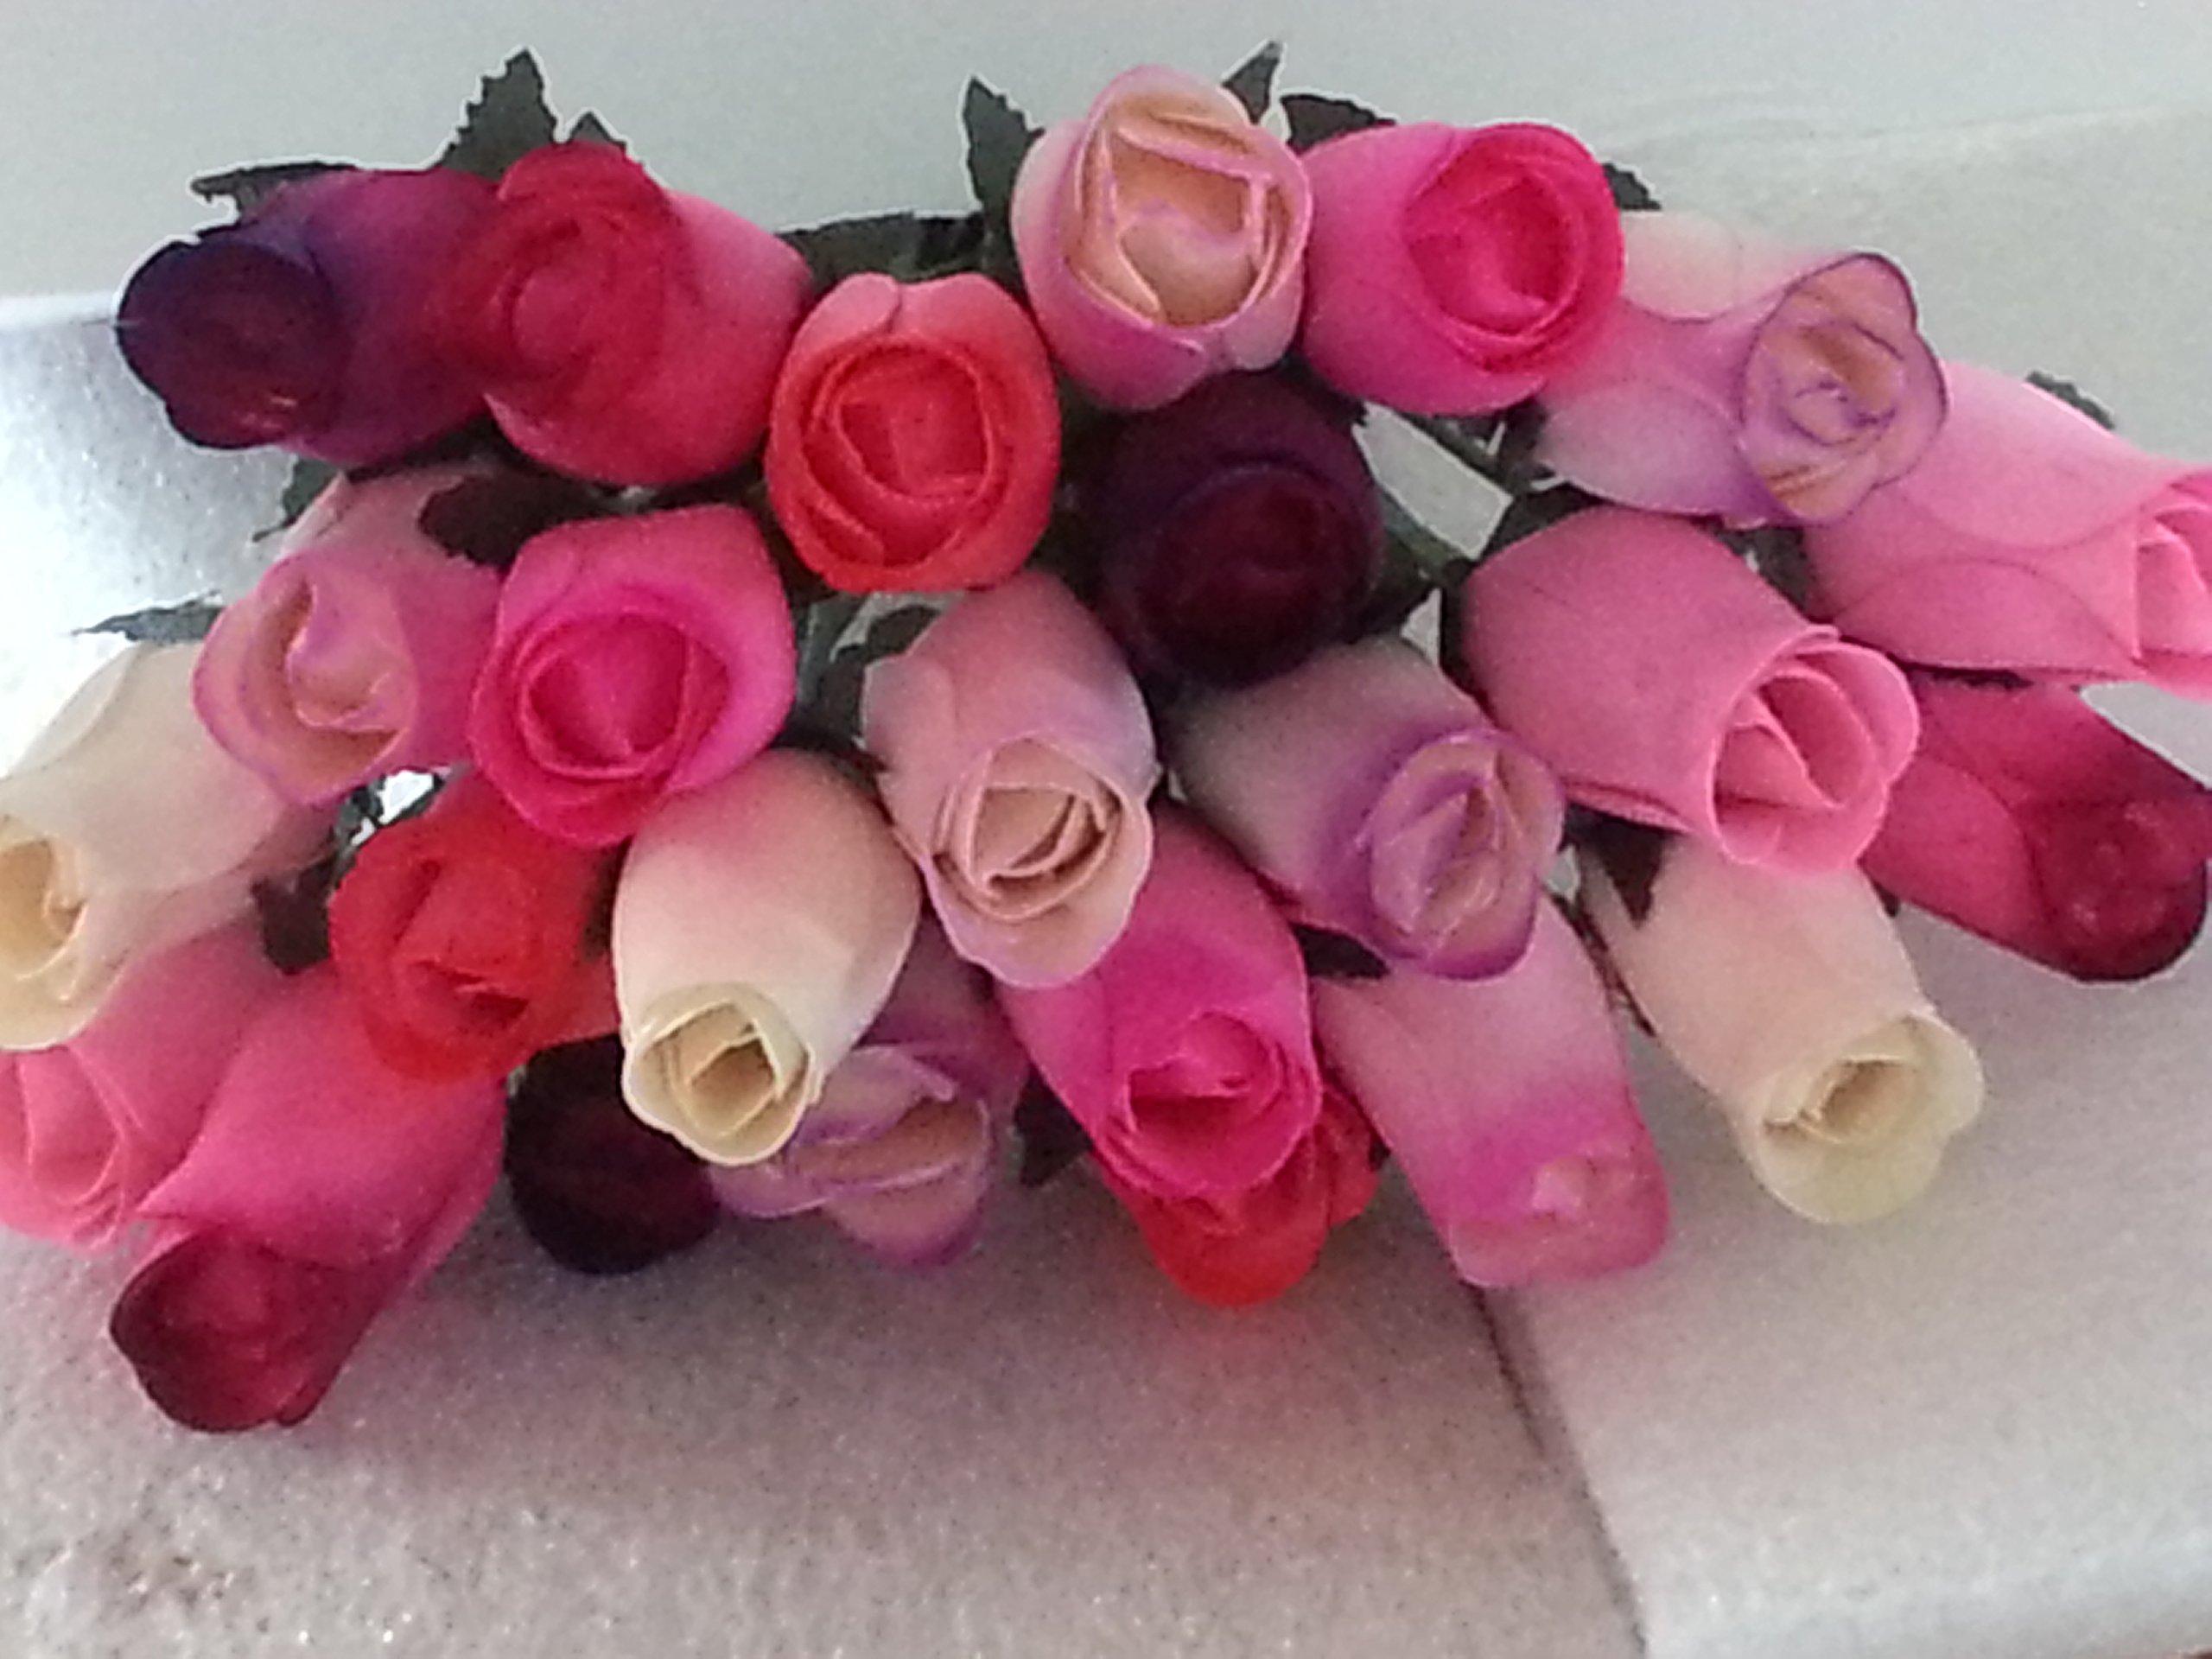 2 Dozen Wooden Roses Mixture of 8 Colors-Little Chicago Distributing